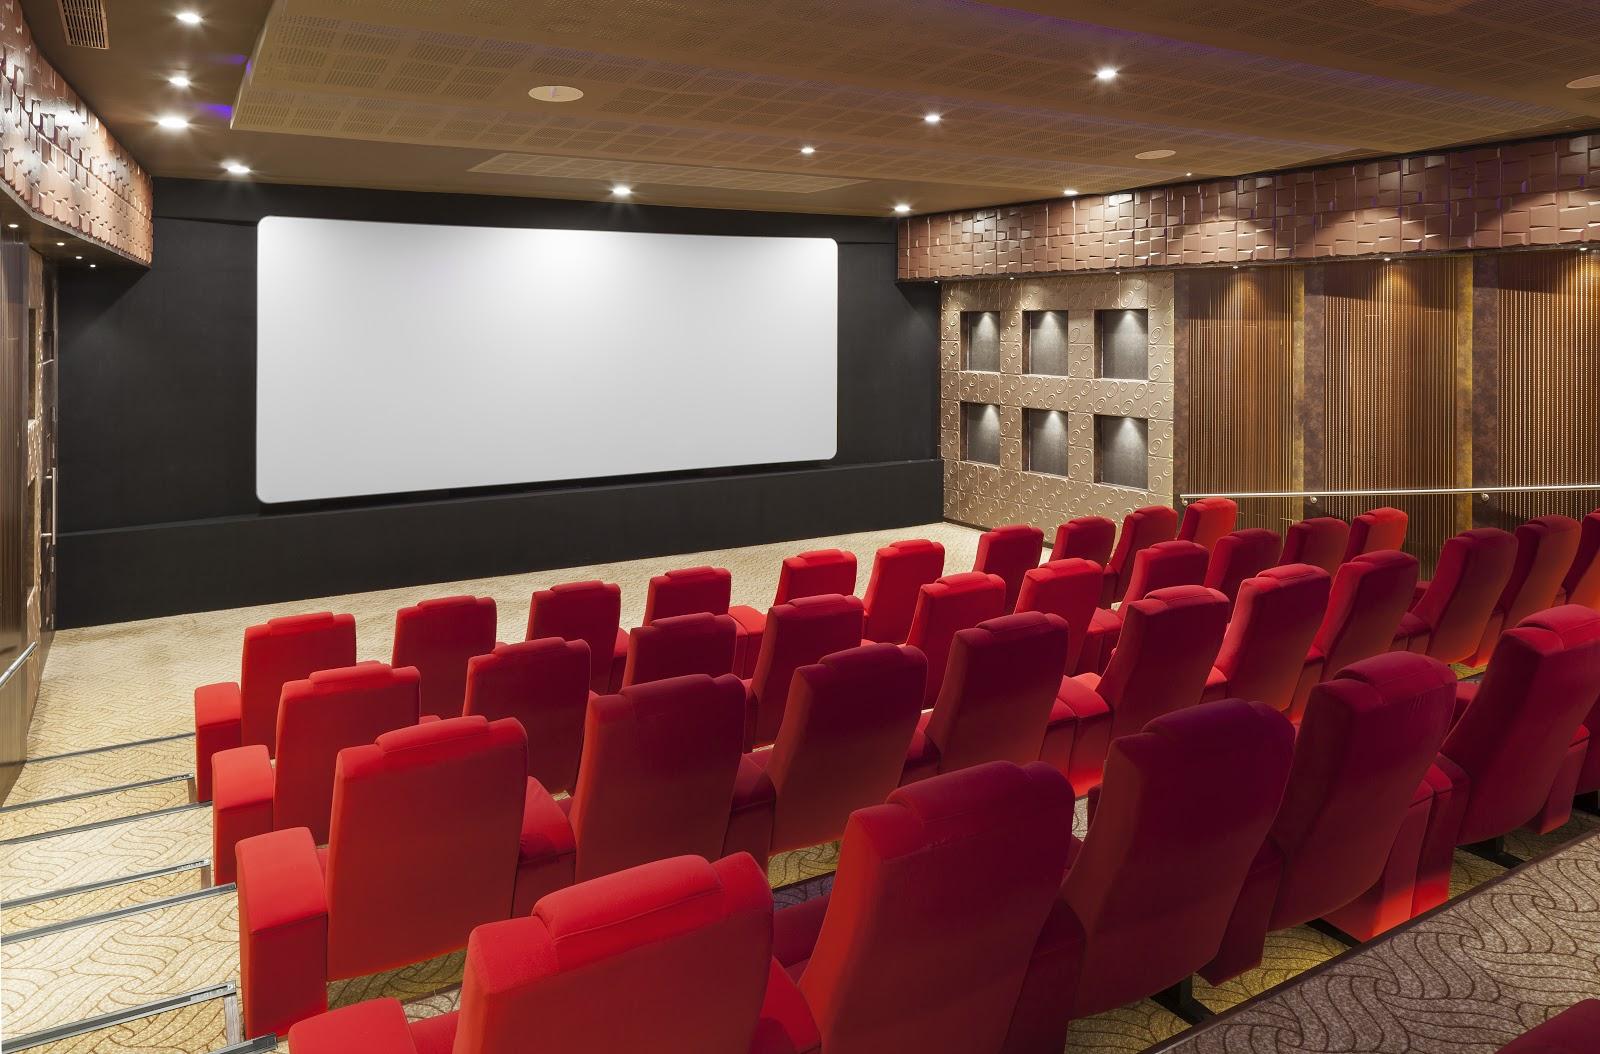 A 90 seater Cinema theatre at Nana Nani Homes